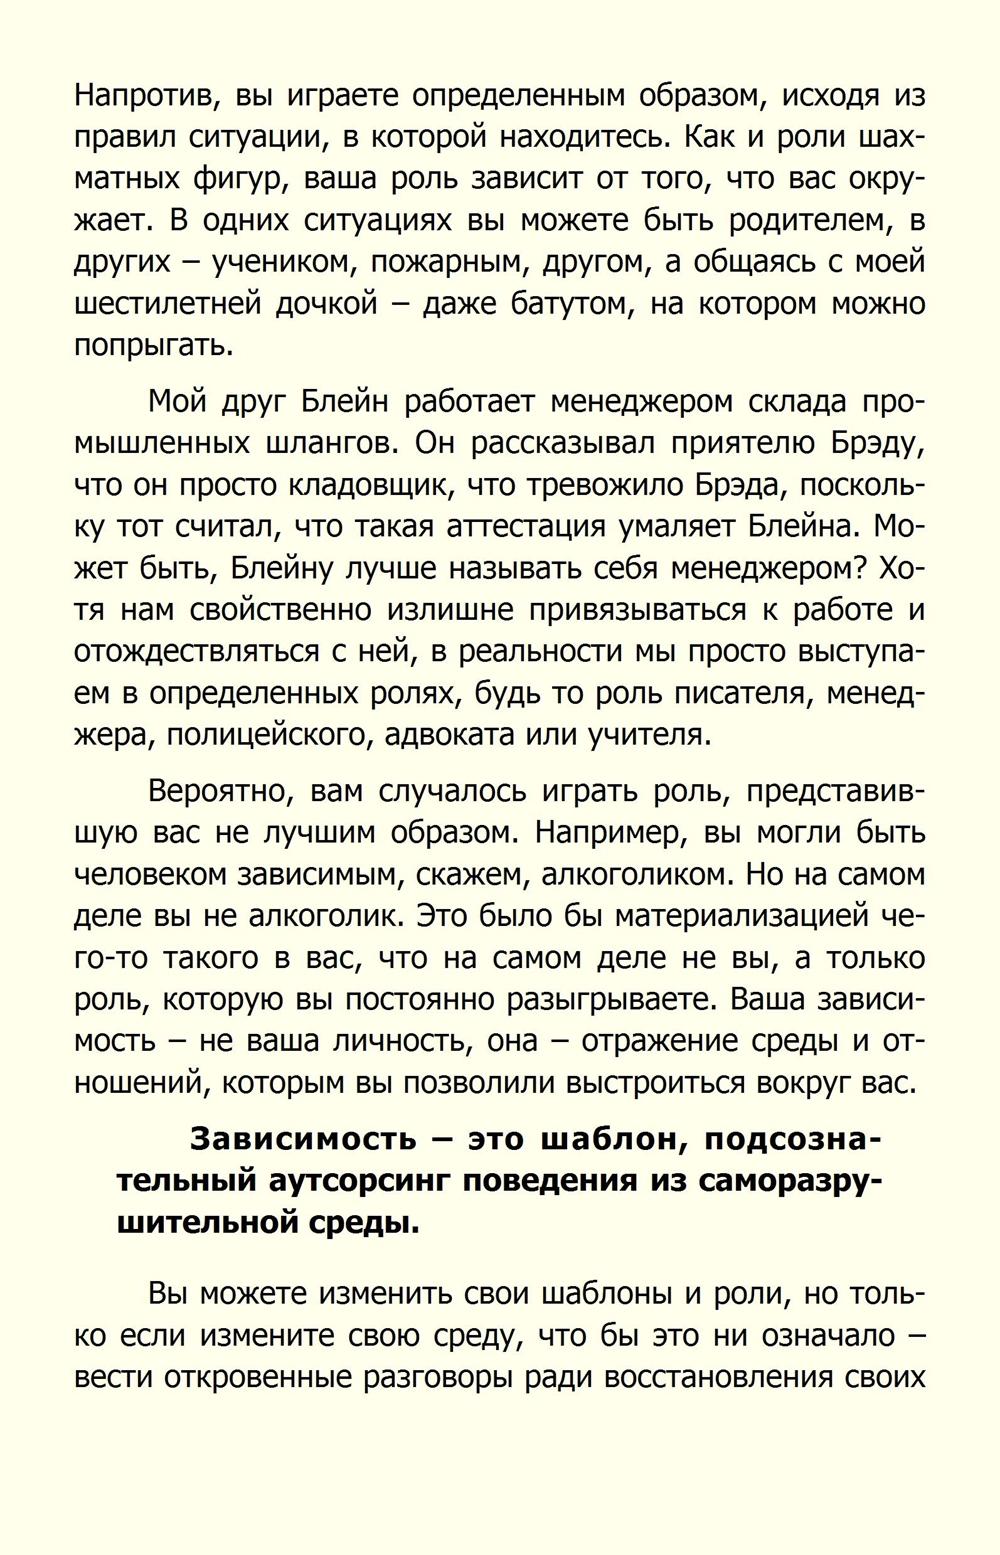 http://ipic.su/img/img7/fs/Silavolinerabotaet_059.1579720183.jpg